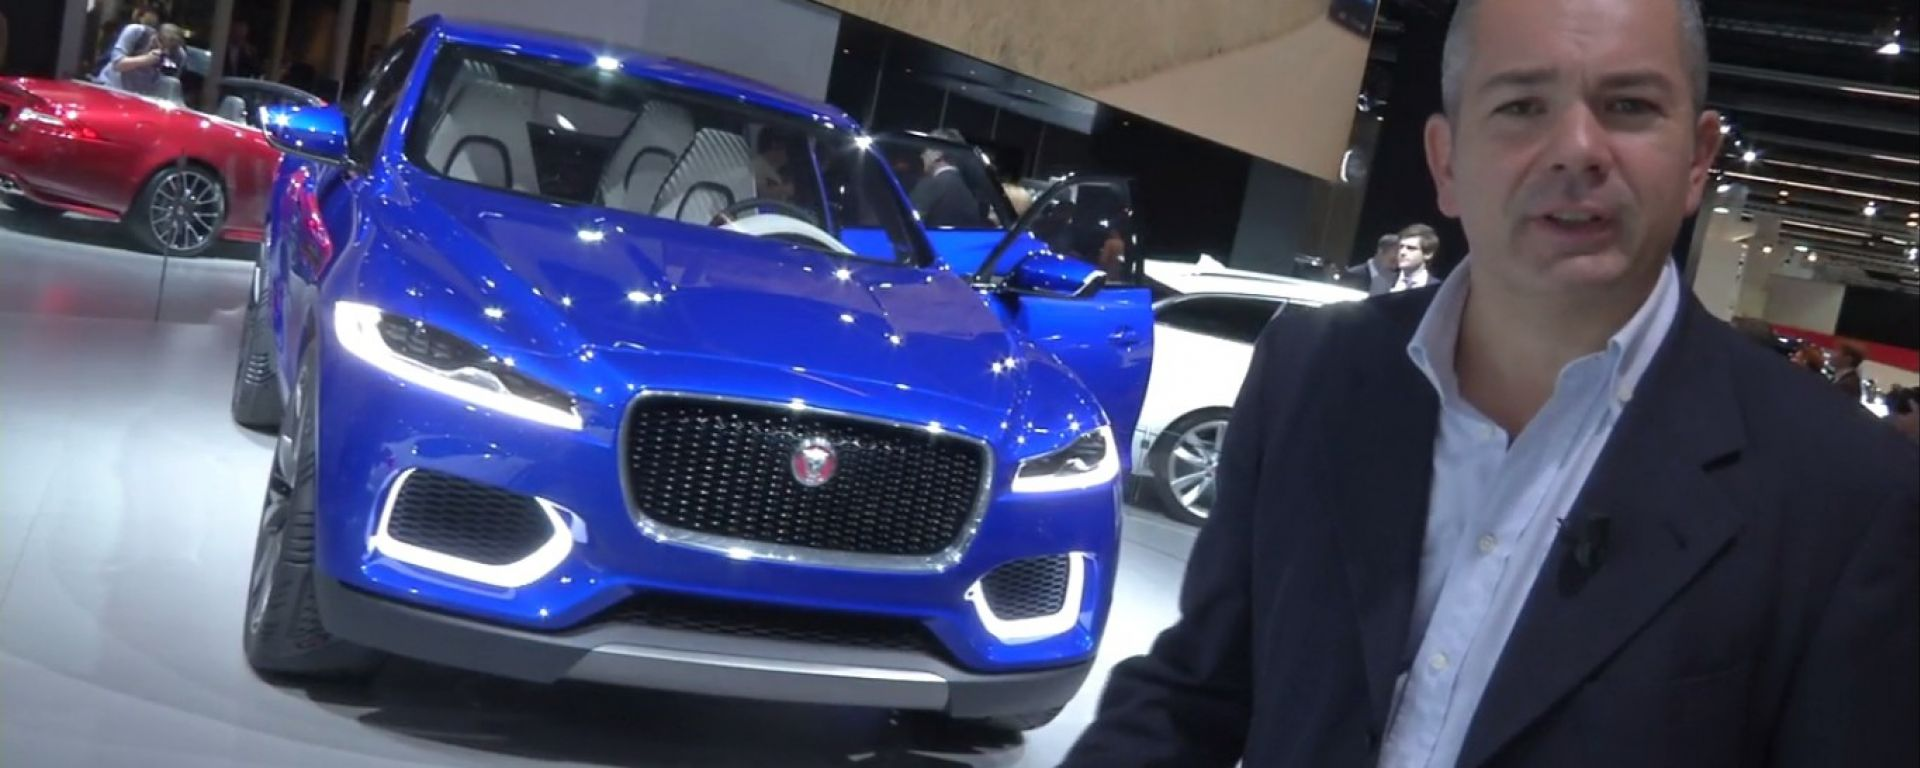 Francoforte 2013, lo stand Jaguar